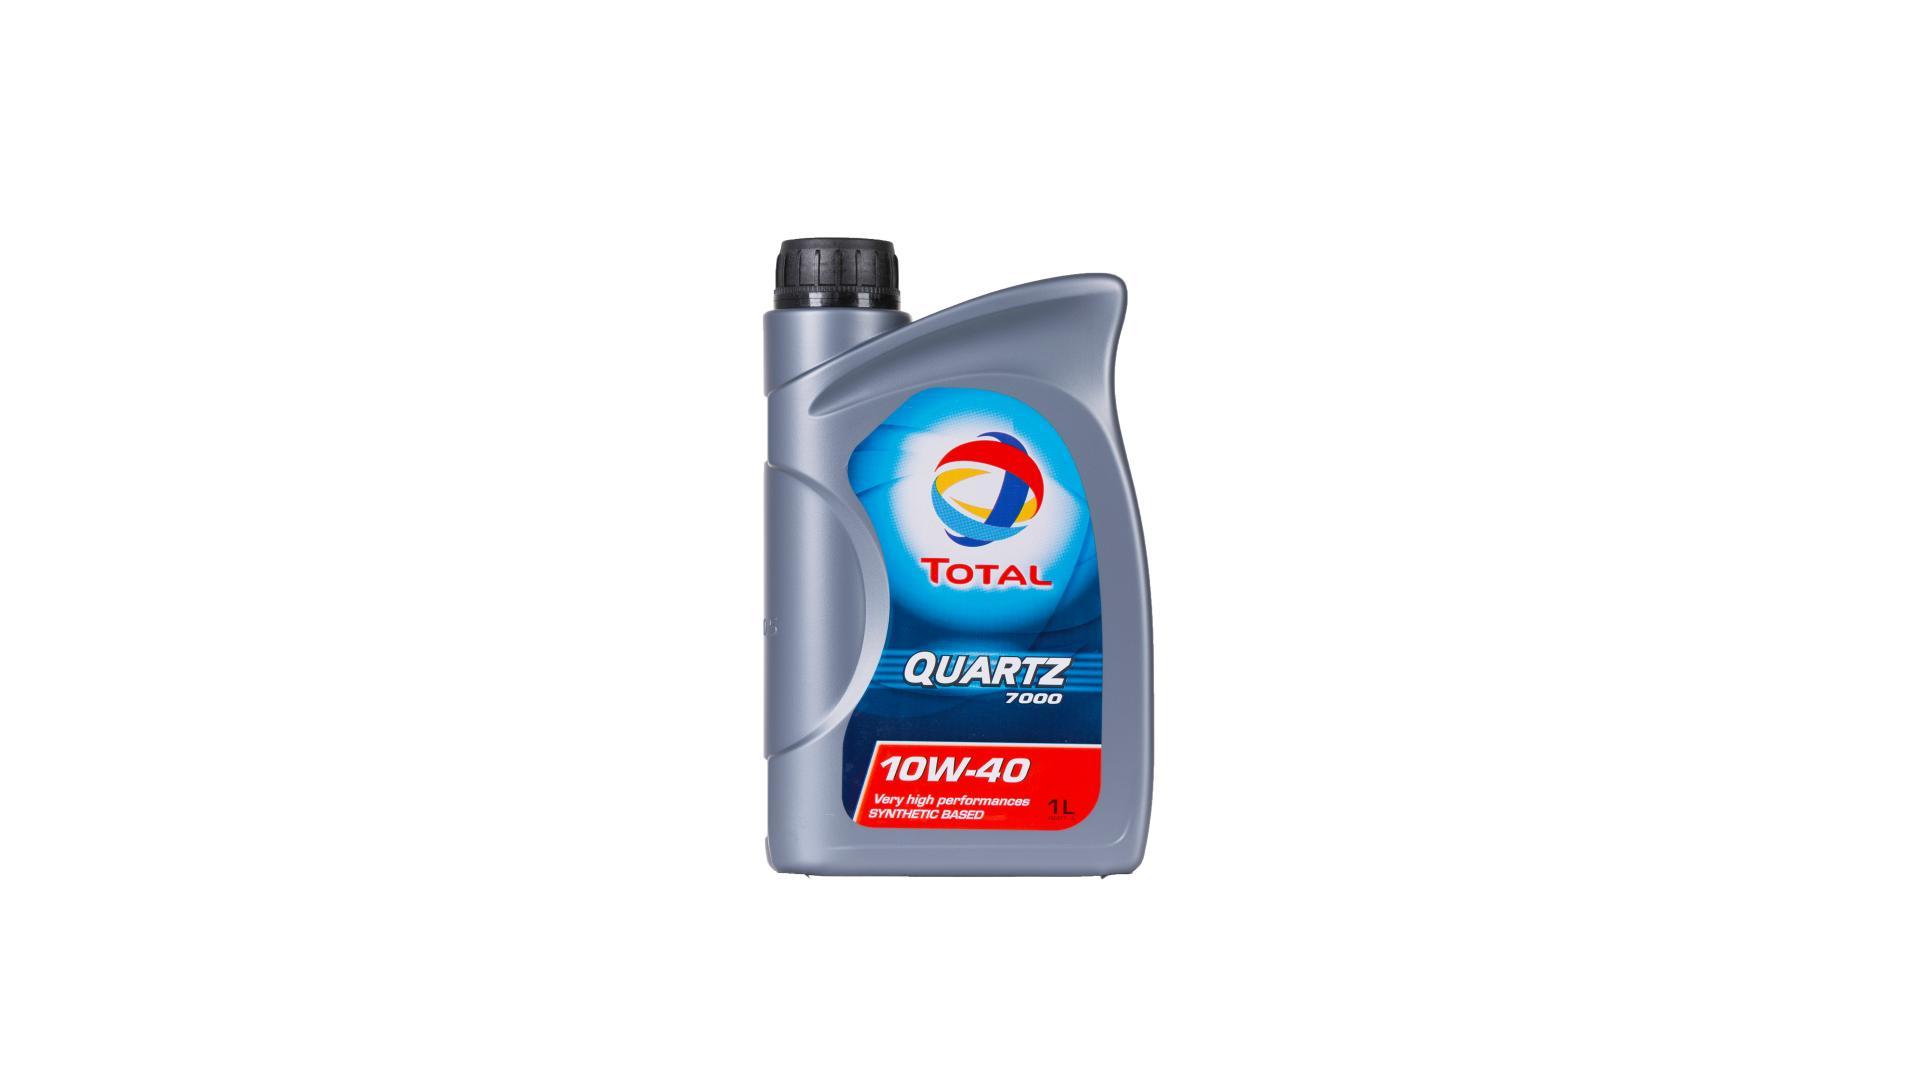 Total 10w-40 Quartz 7000 1L (201528)